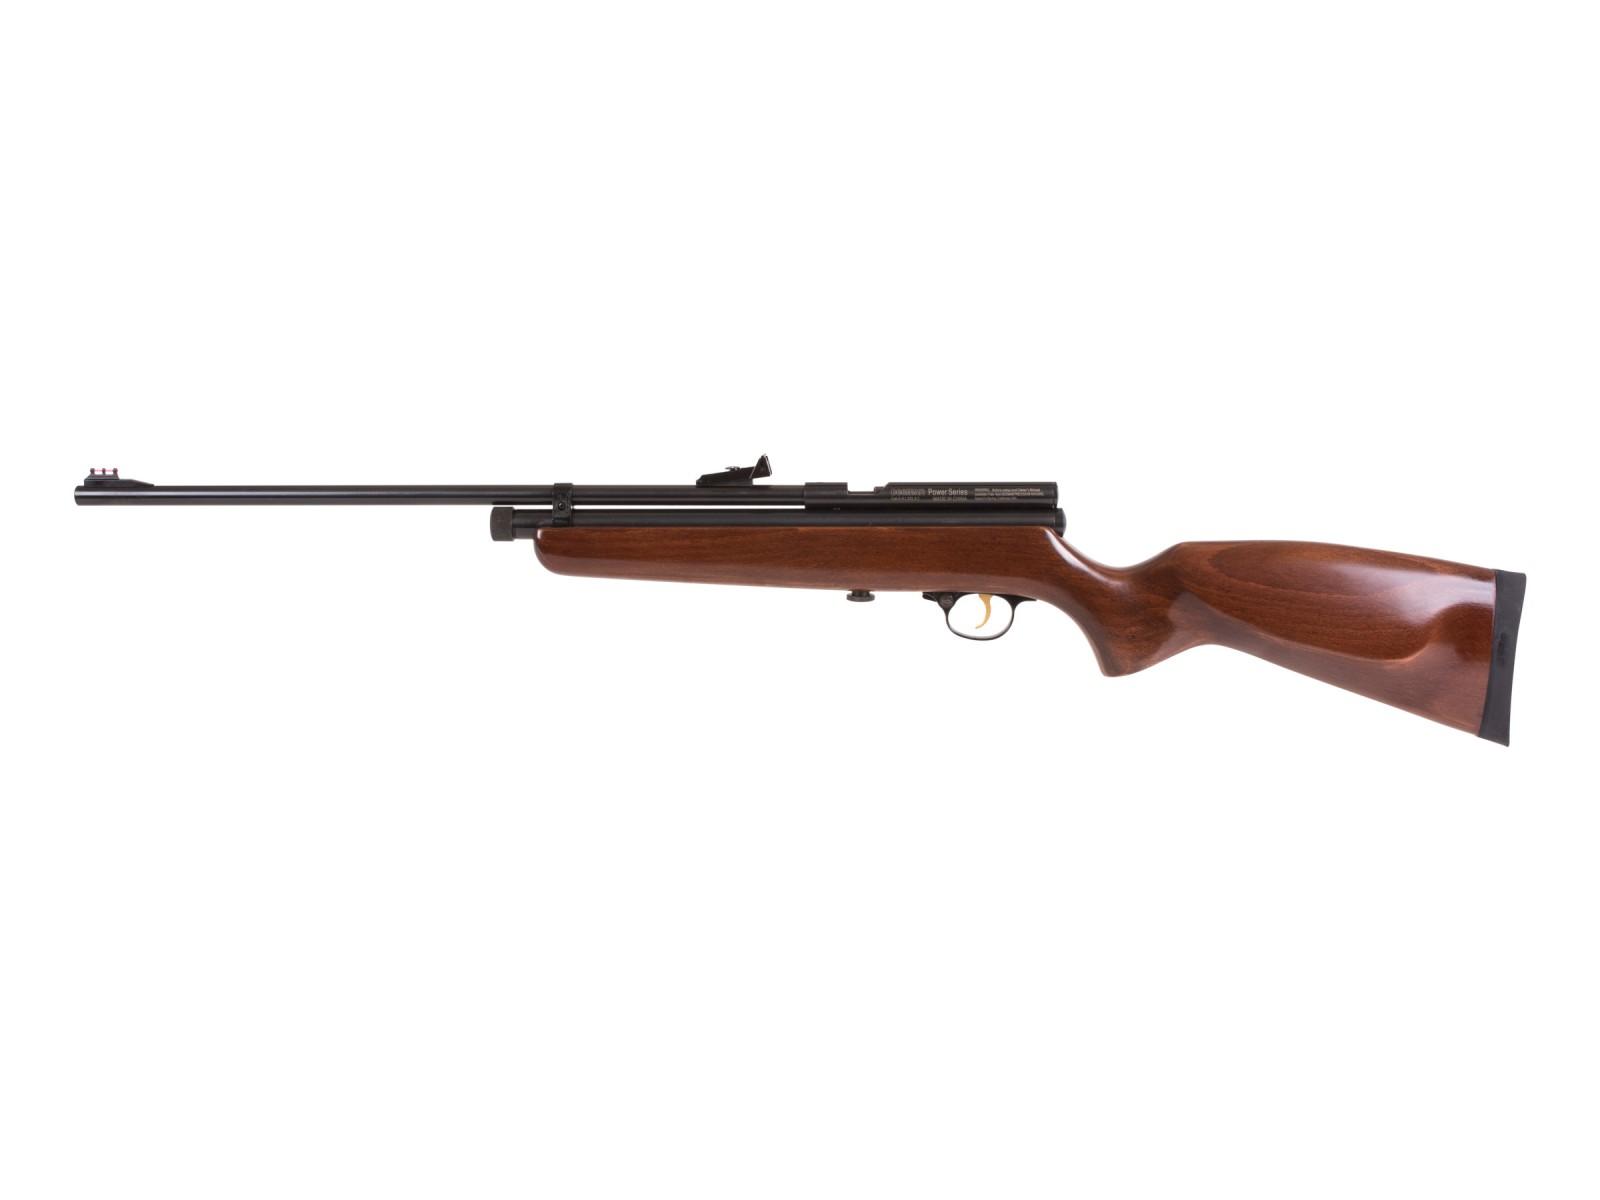 Beeman QB78 Deluxe CO2 Air Rifle 0.177 Image